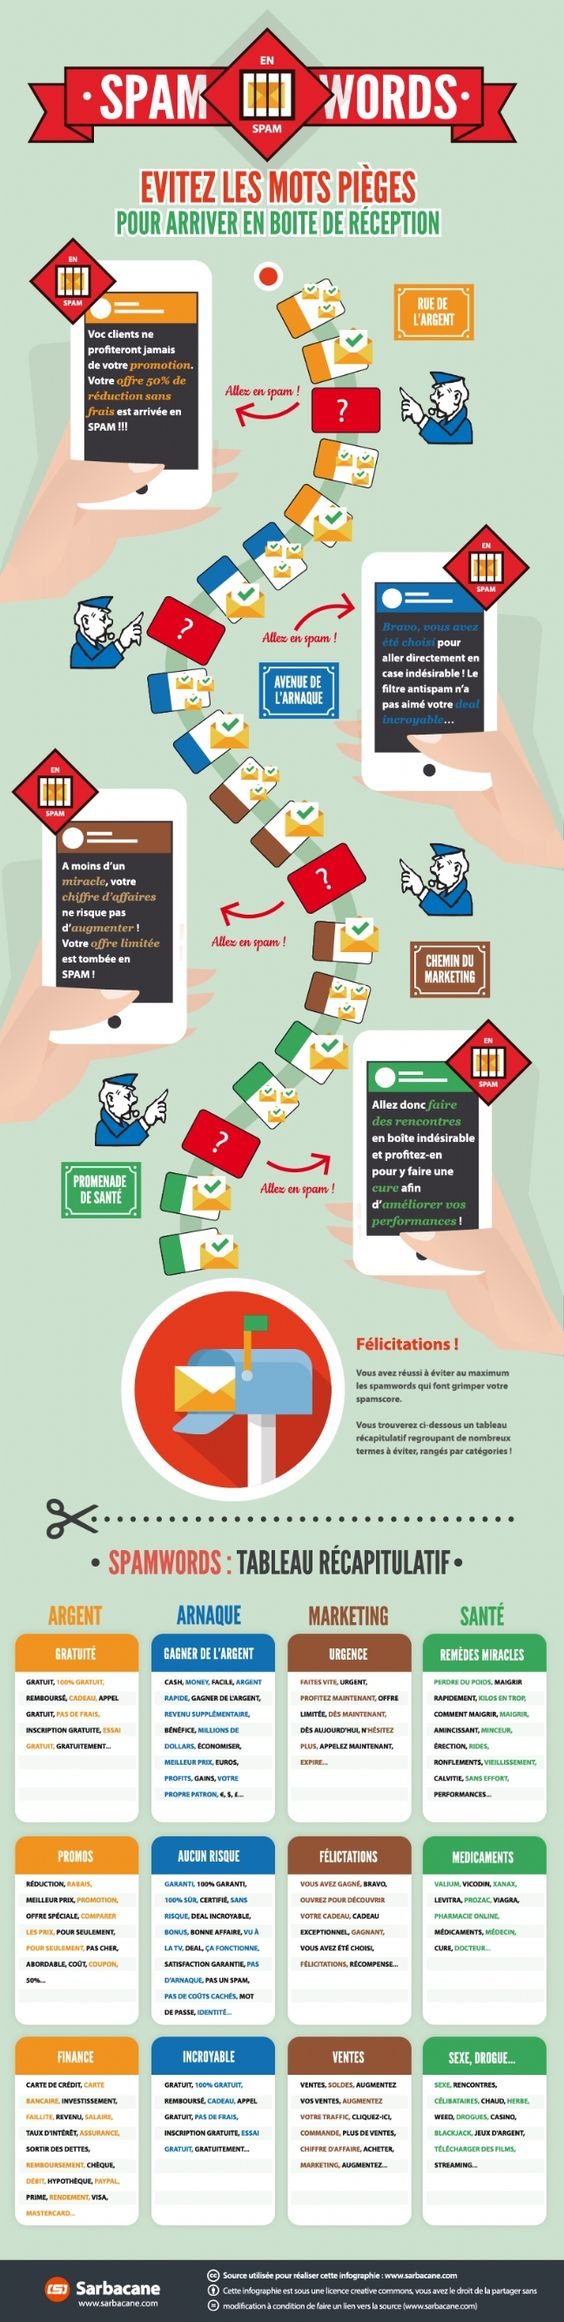 http://www.e-marketing.fr/Thematique/digital-data-1004/Infographies/Exclu-mail-mots-eviter-pas-atterrir-dans-spams-301747.htm